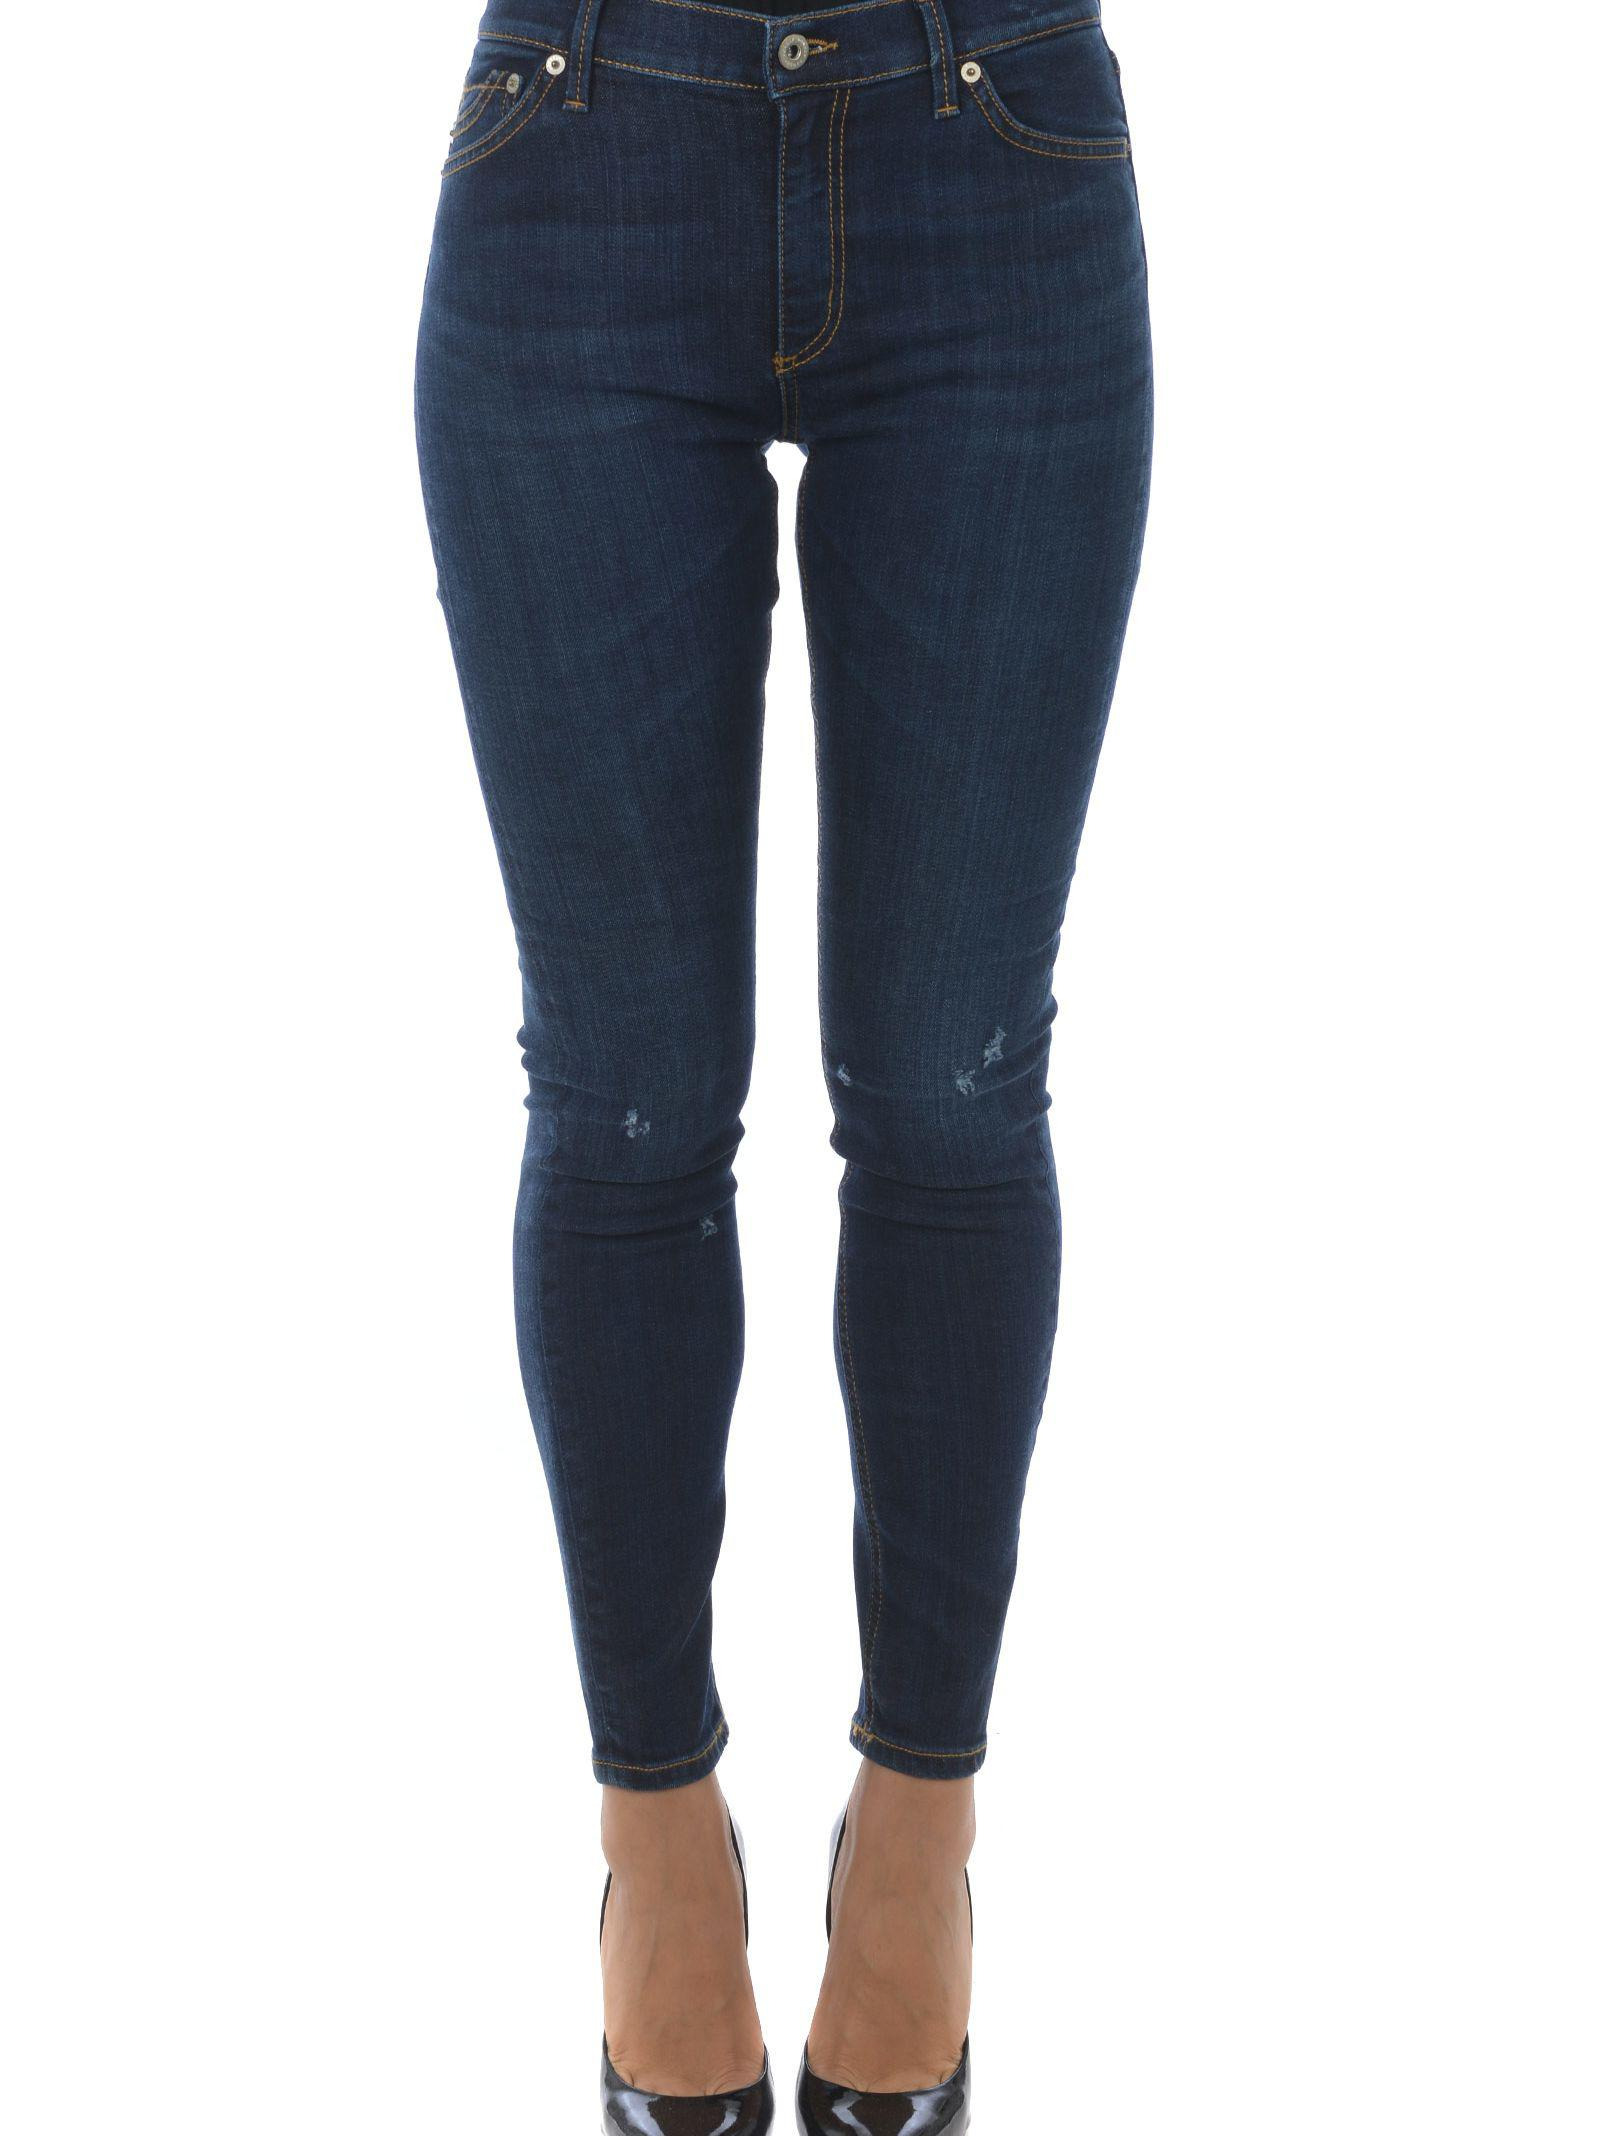 reputable site fa62b 34071 Skinny Jeans in Denim